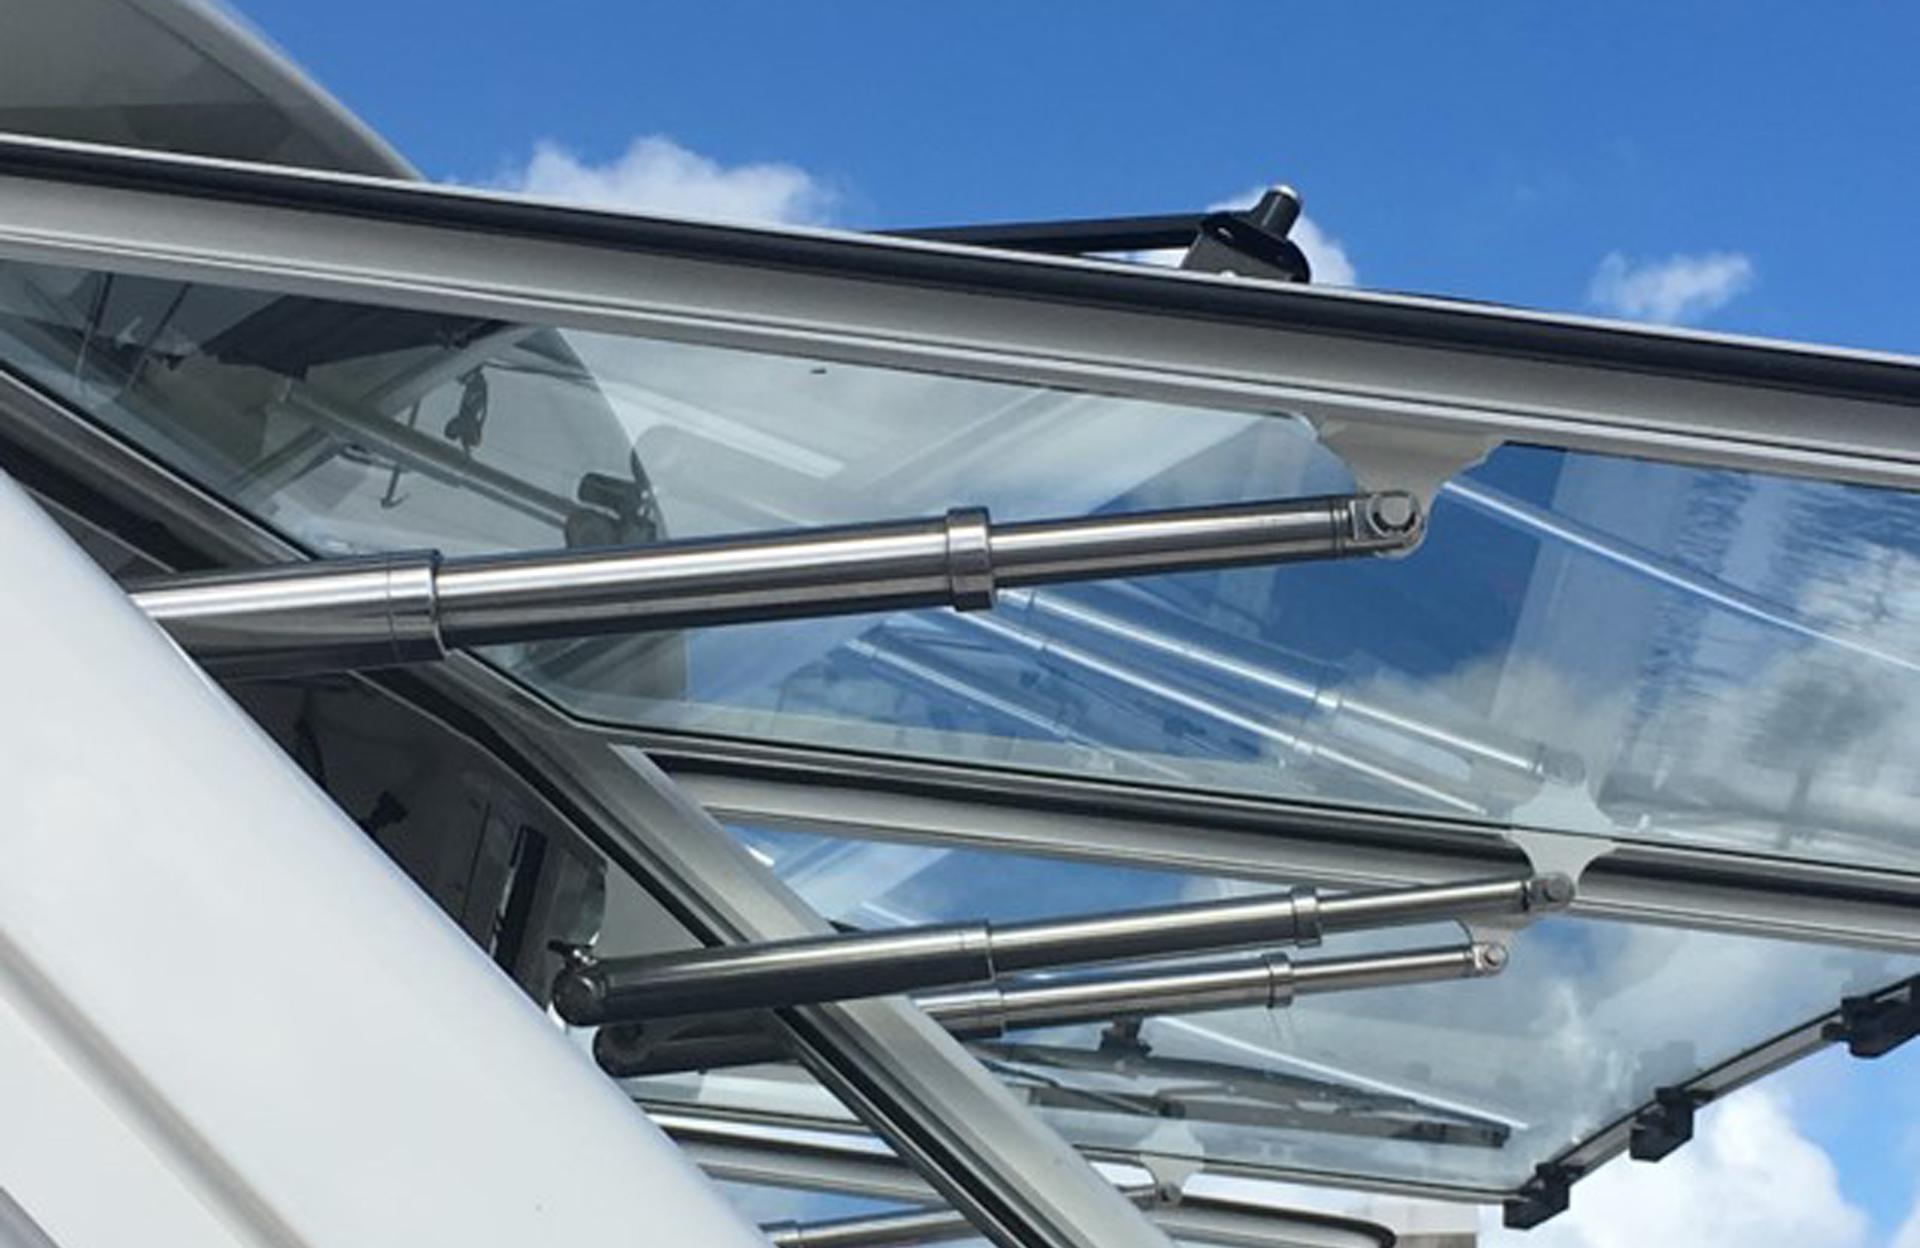 Antuator Venting Windows